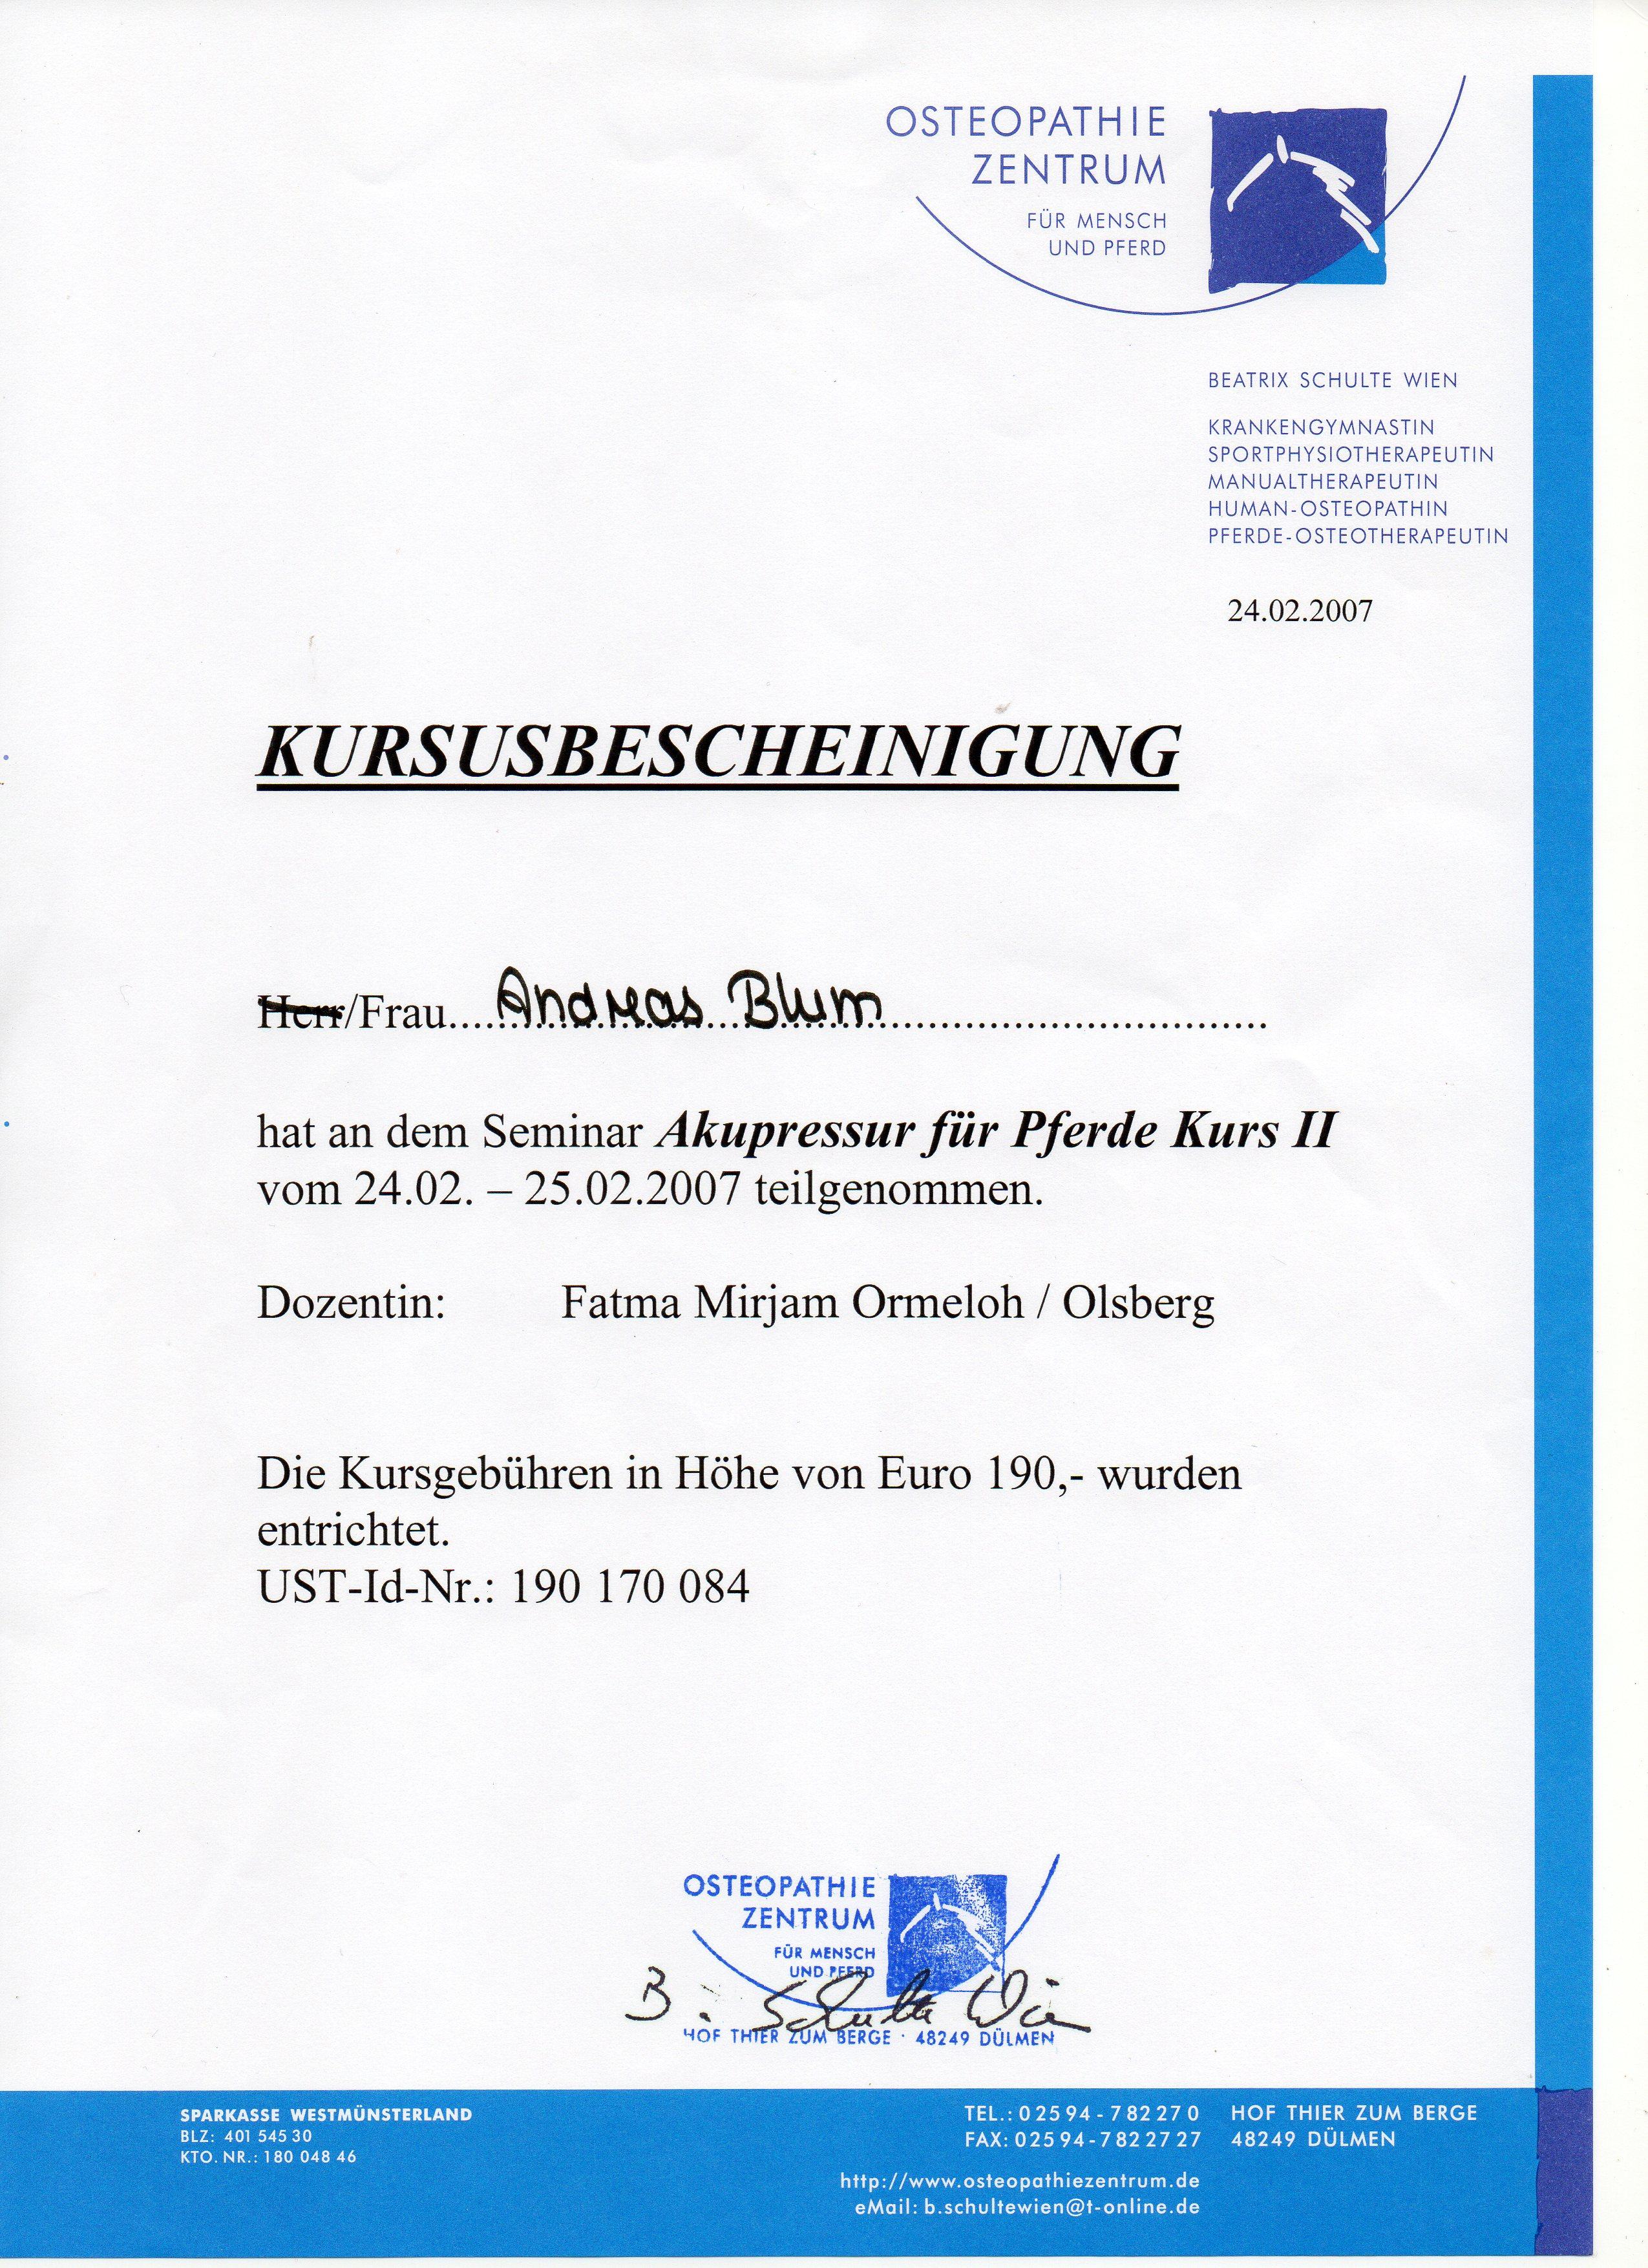 Akupressur II 24.-25.2.2007 bei Fatma Mirjam Ormeloh